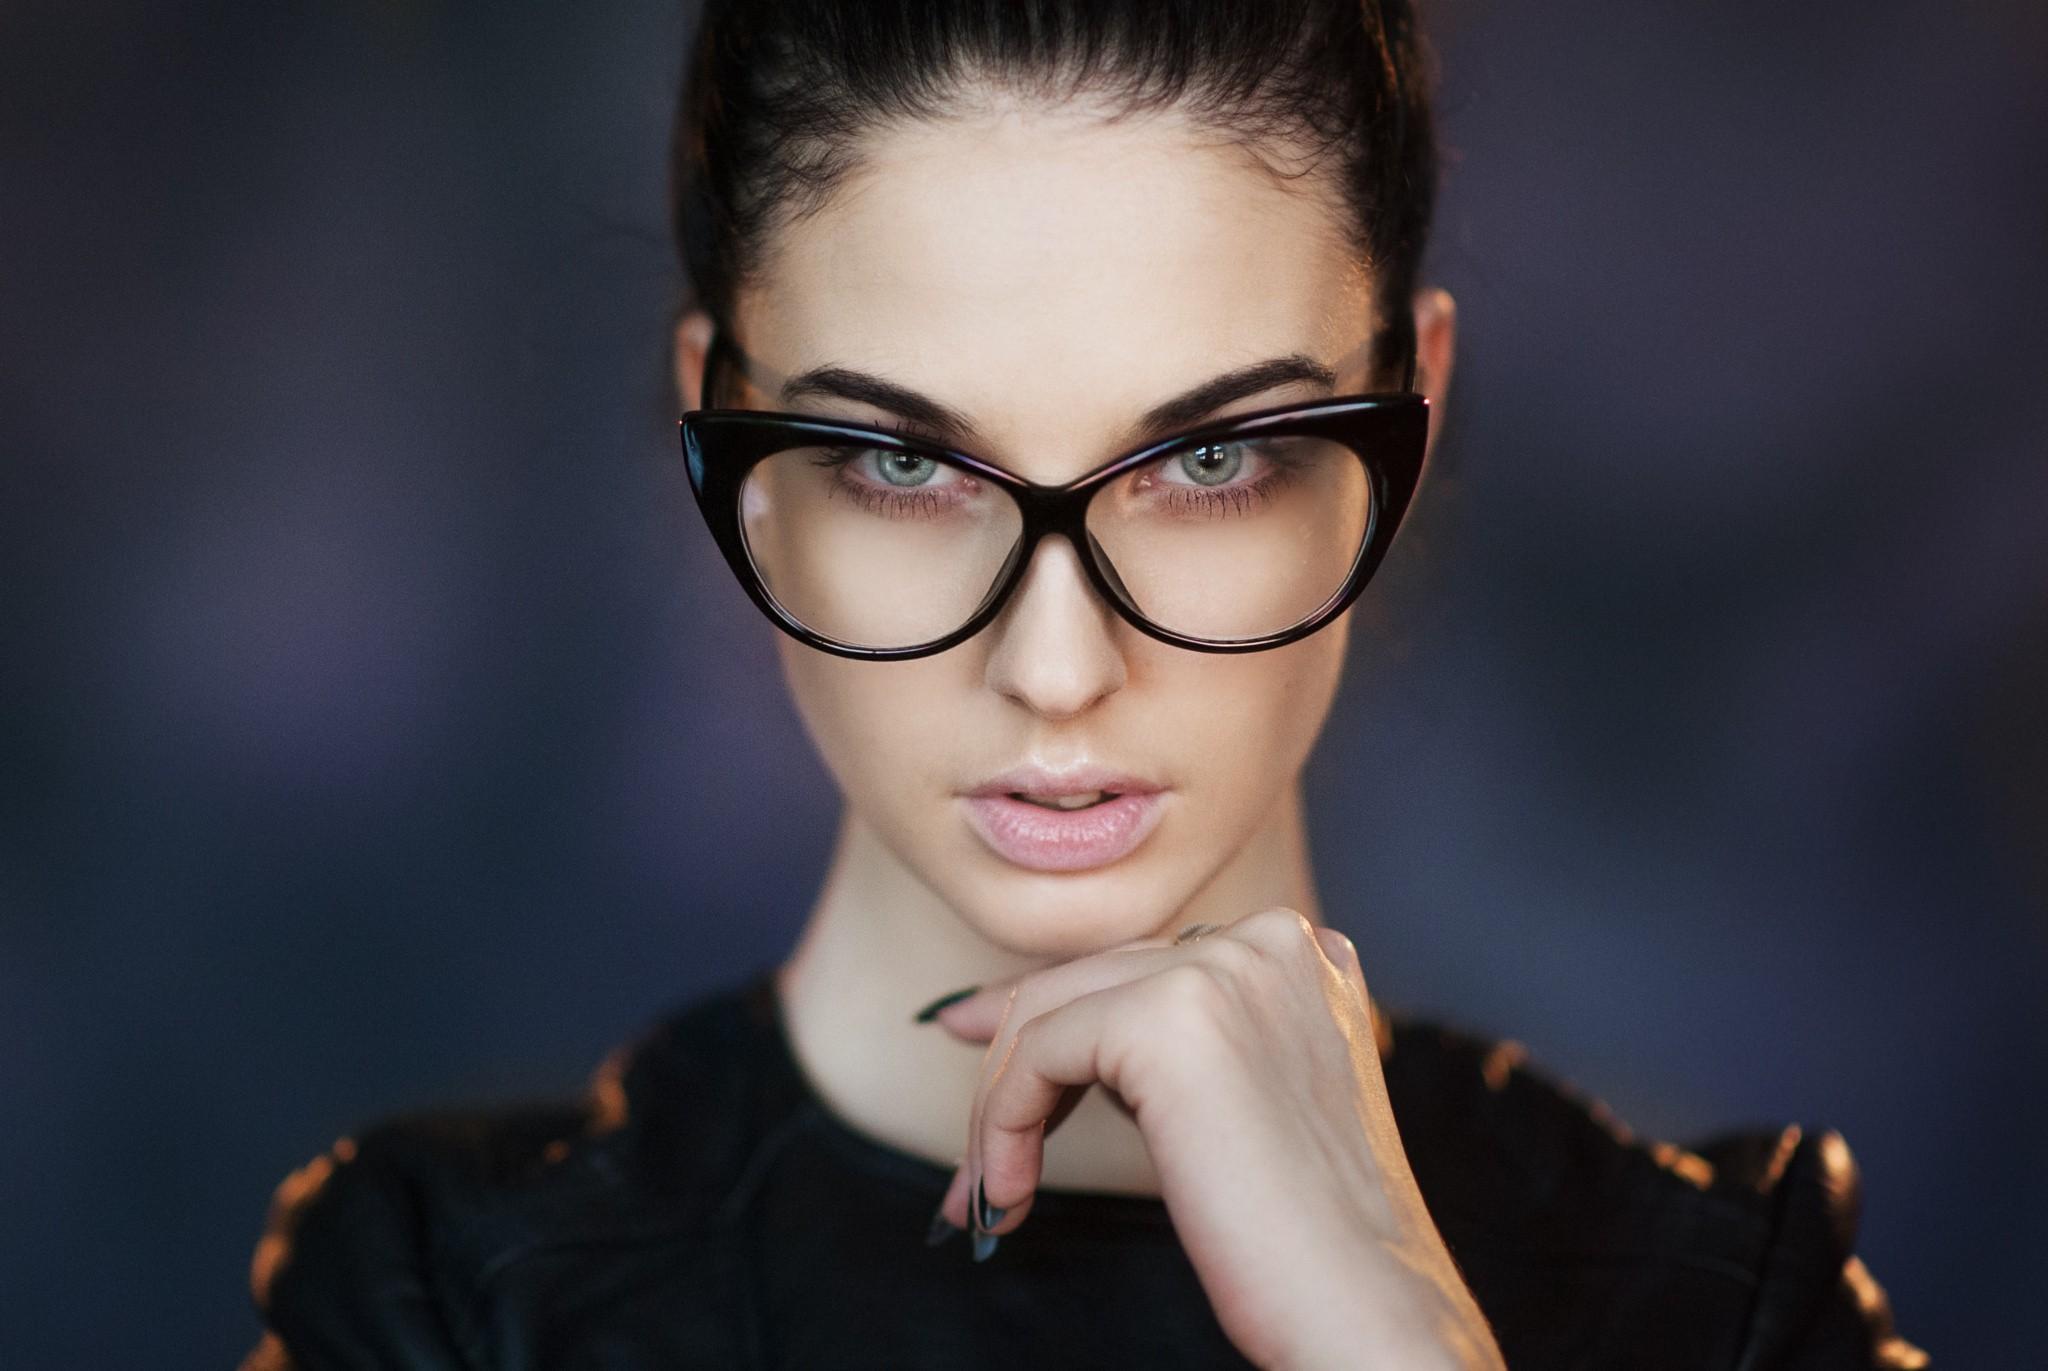 People 2048x1371 women model looking at viewer Maxim Maksimov Alla Berger brunette portrait fake glasses Maxim Maximov women with glasses blue eyes